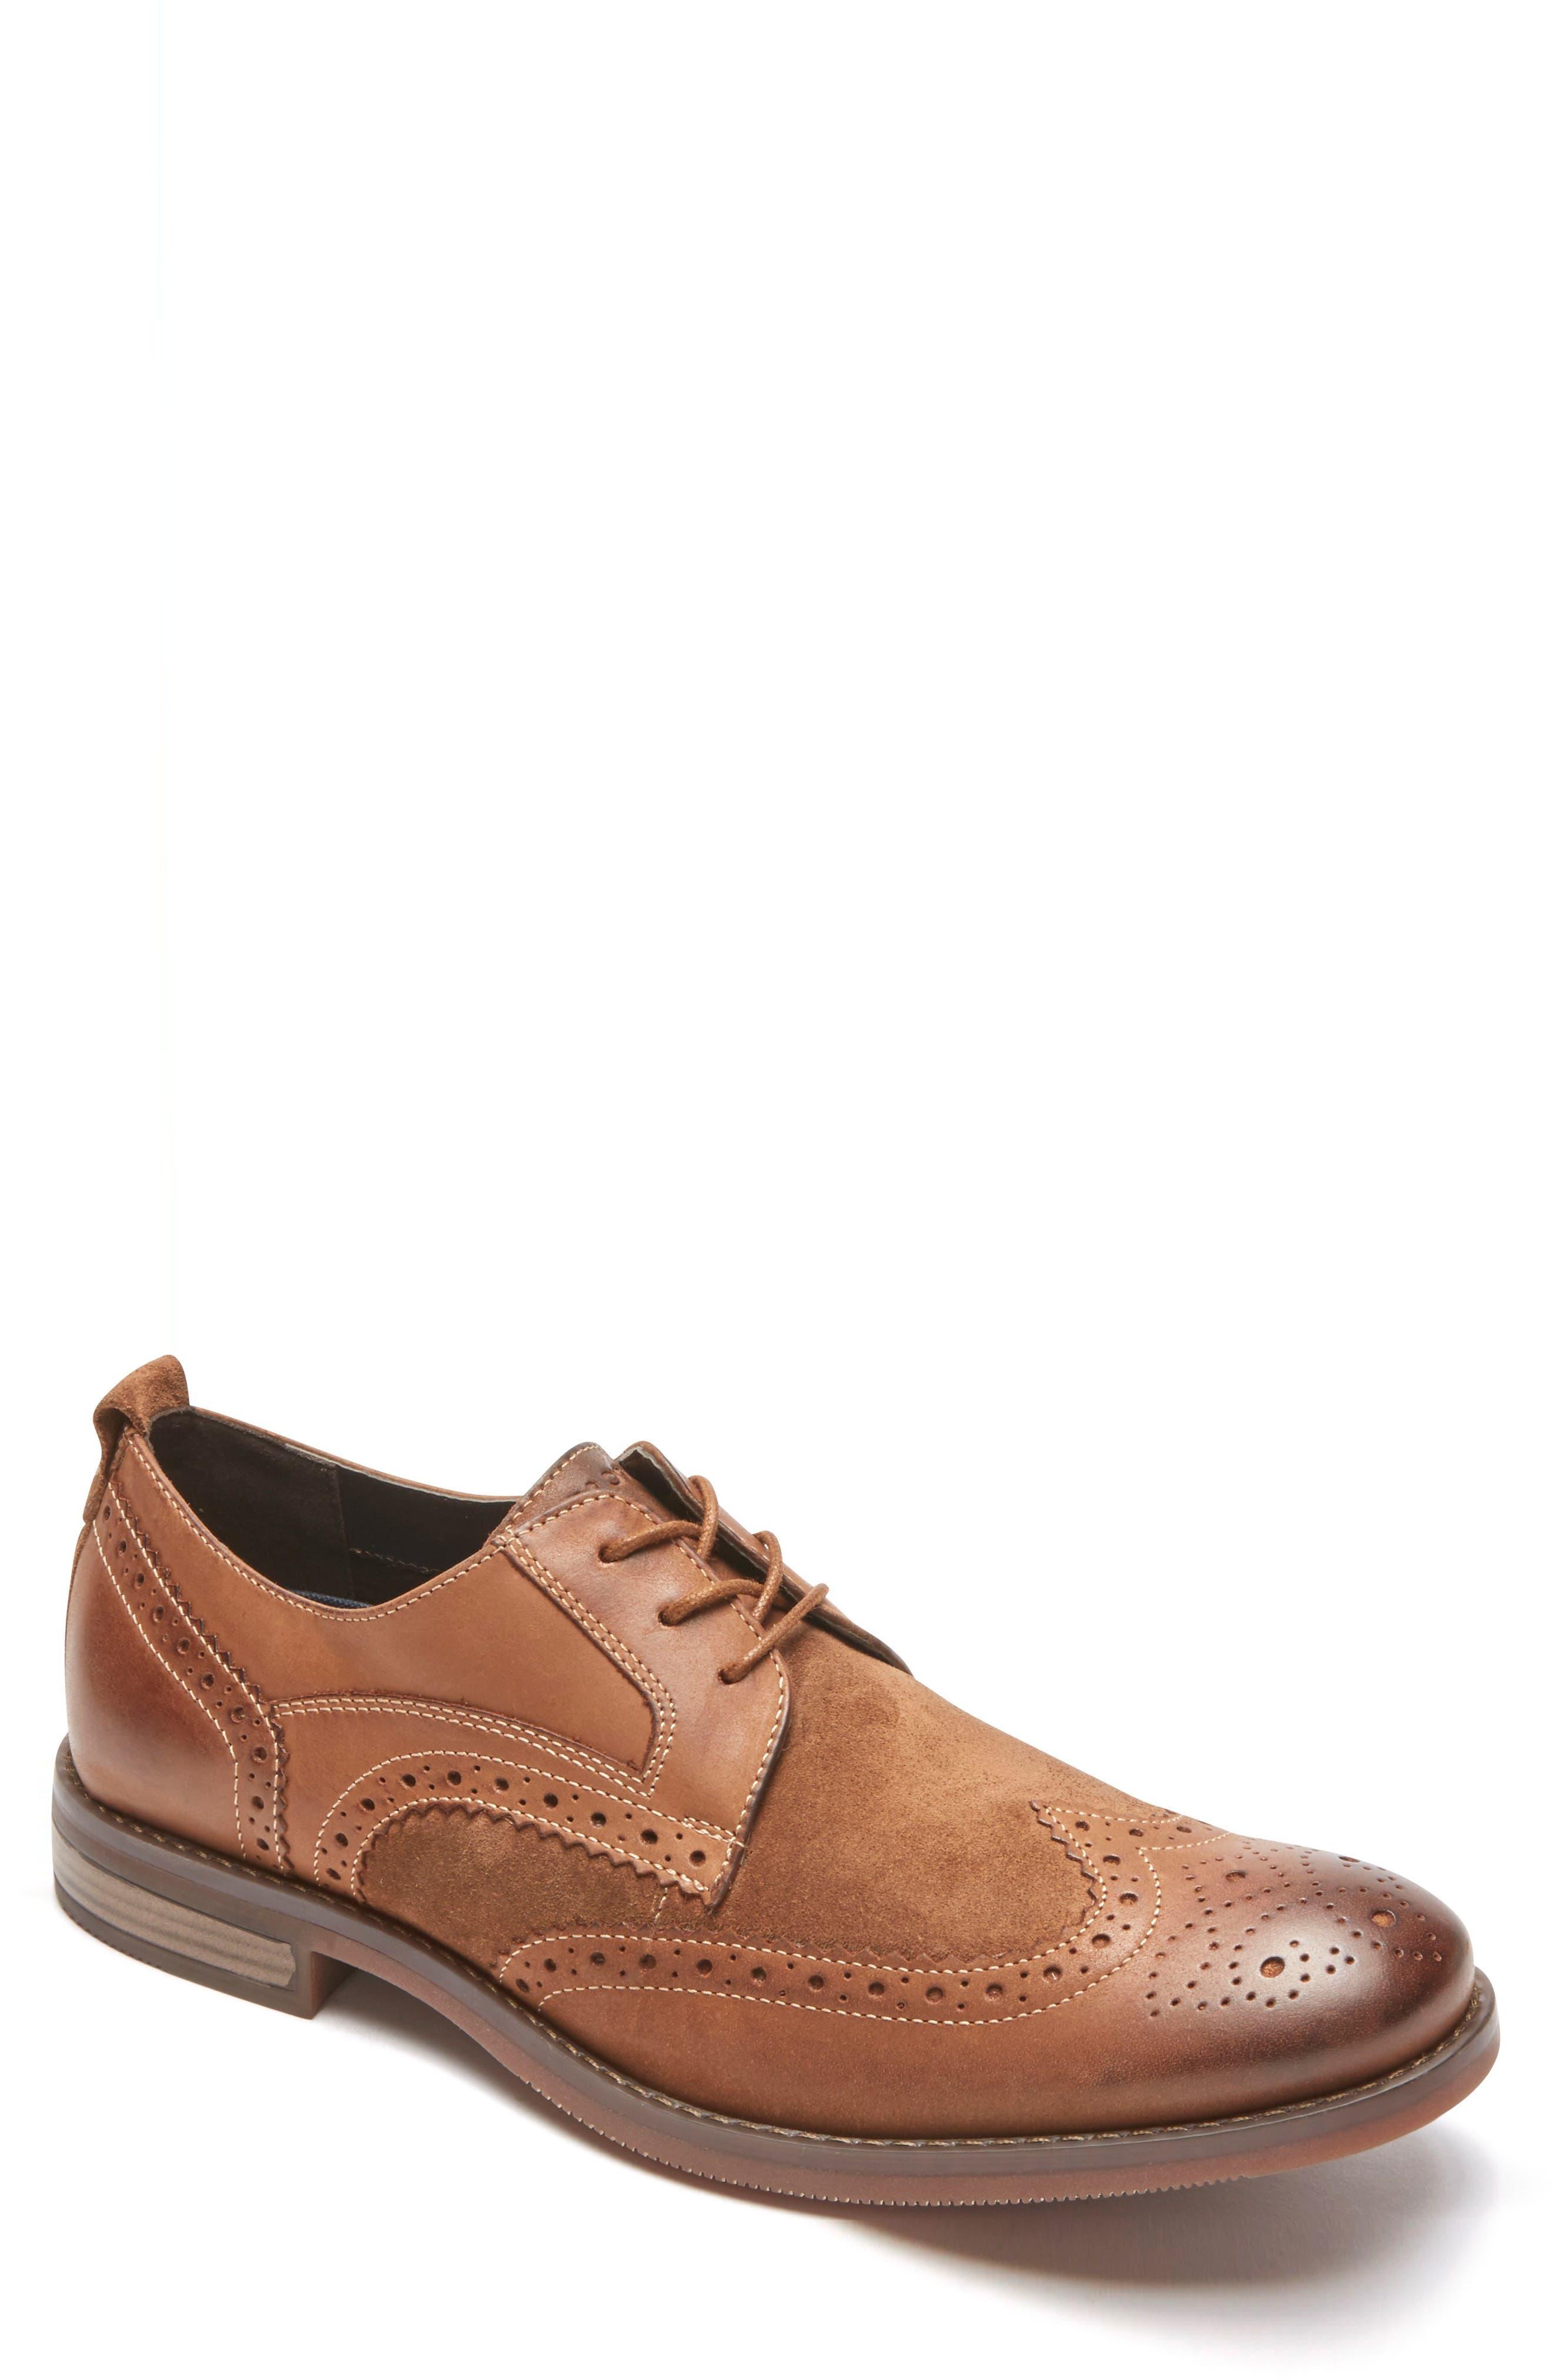 Wynstin Wingtip,                         Main,                         color, Tobacco Leather/ Suede